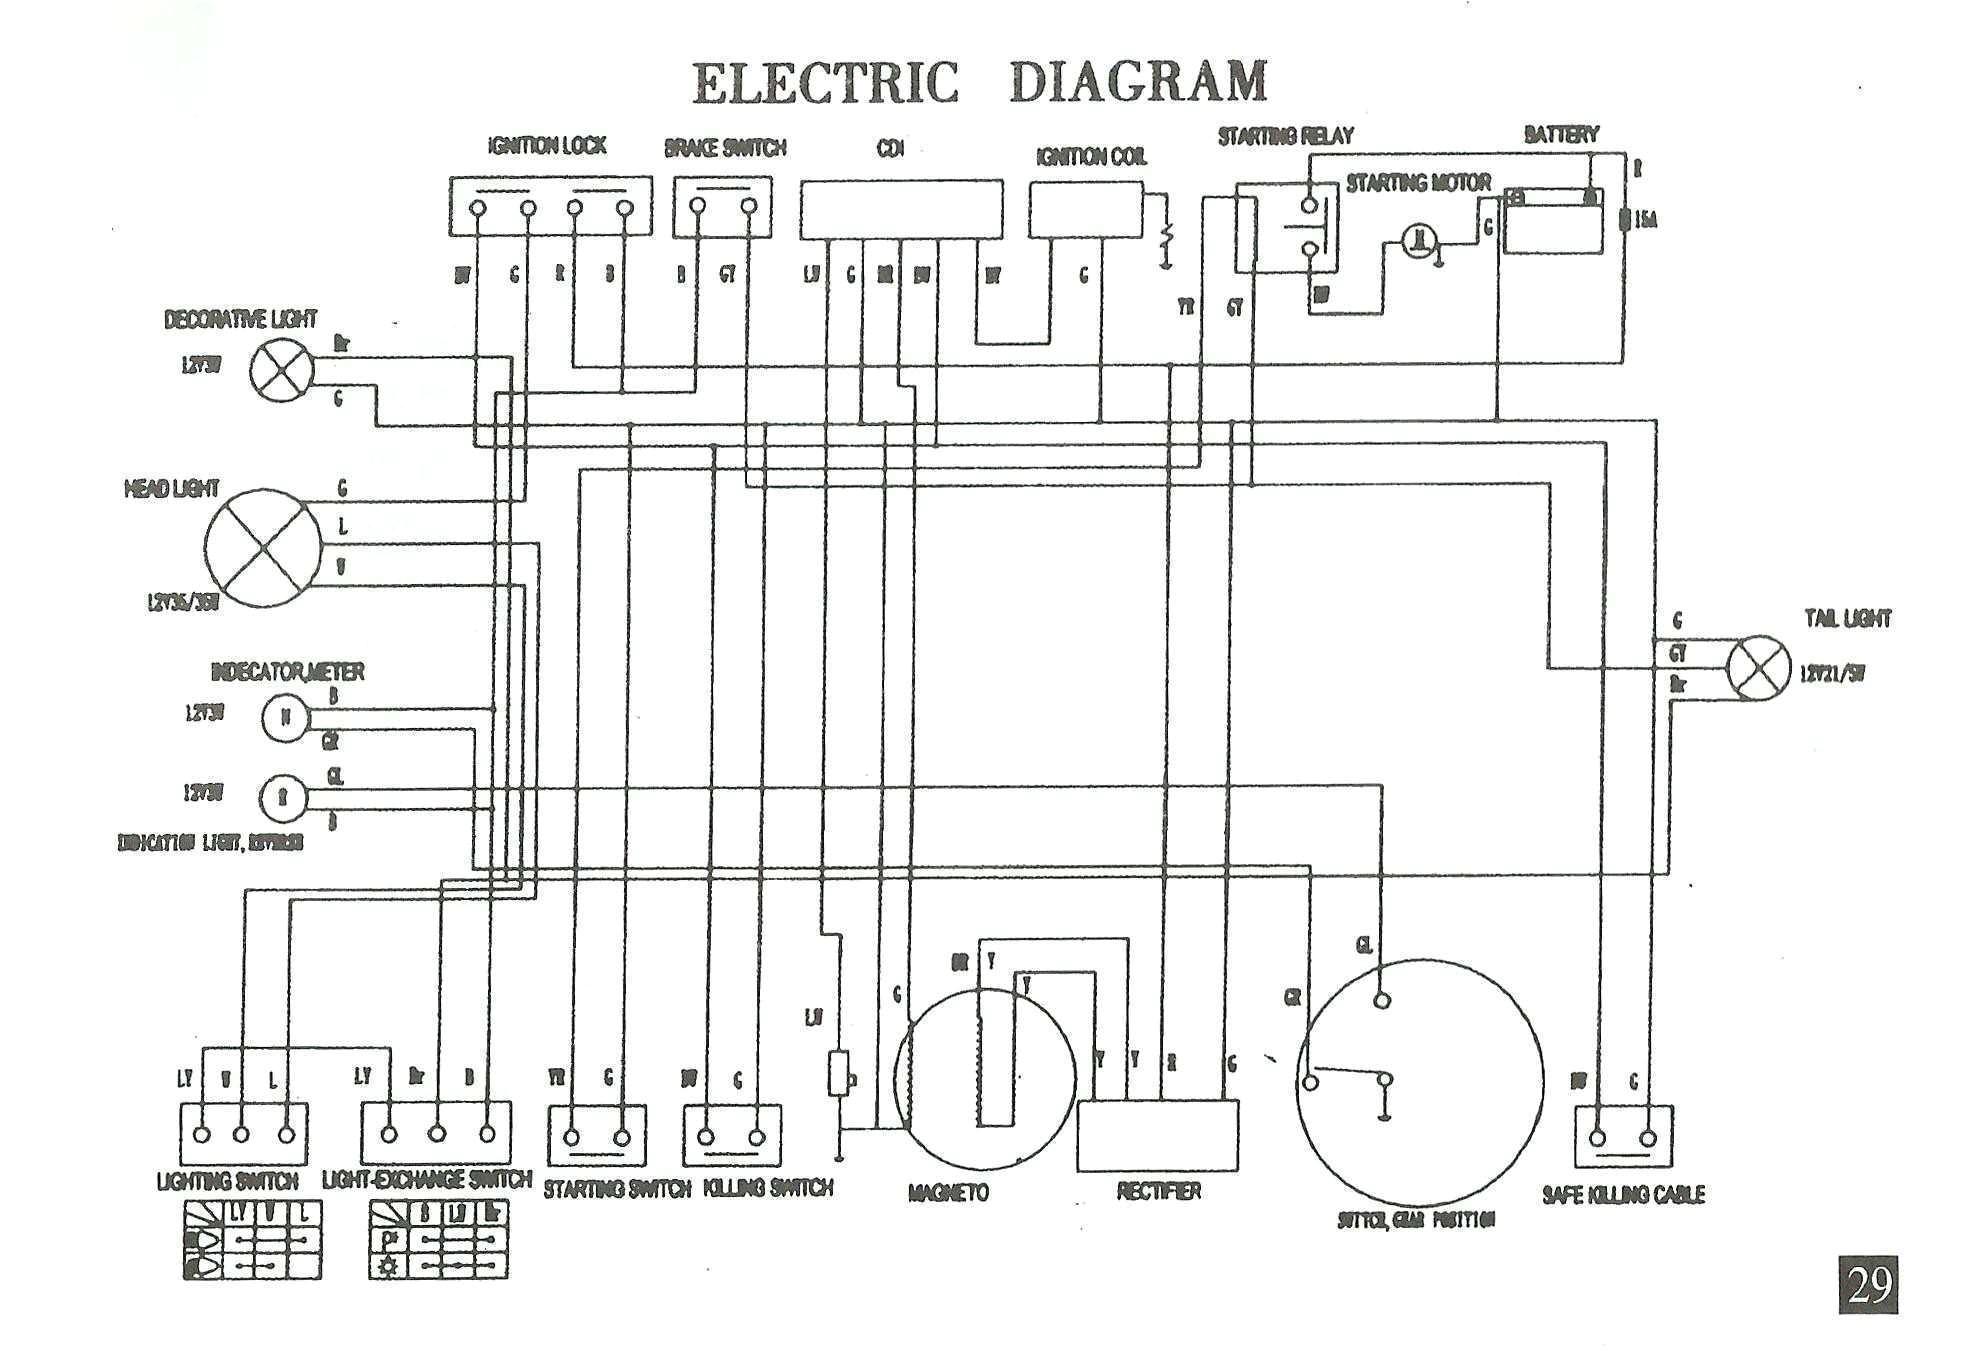 vip scooter wiring diagram elegant vip wiring diagram electrical